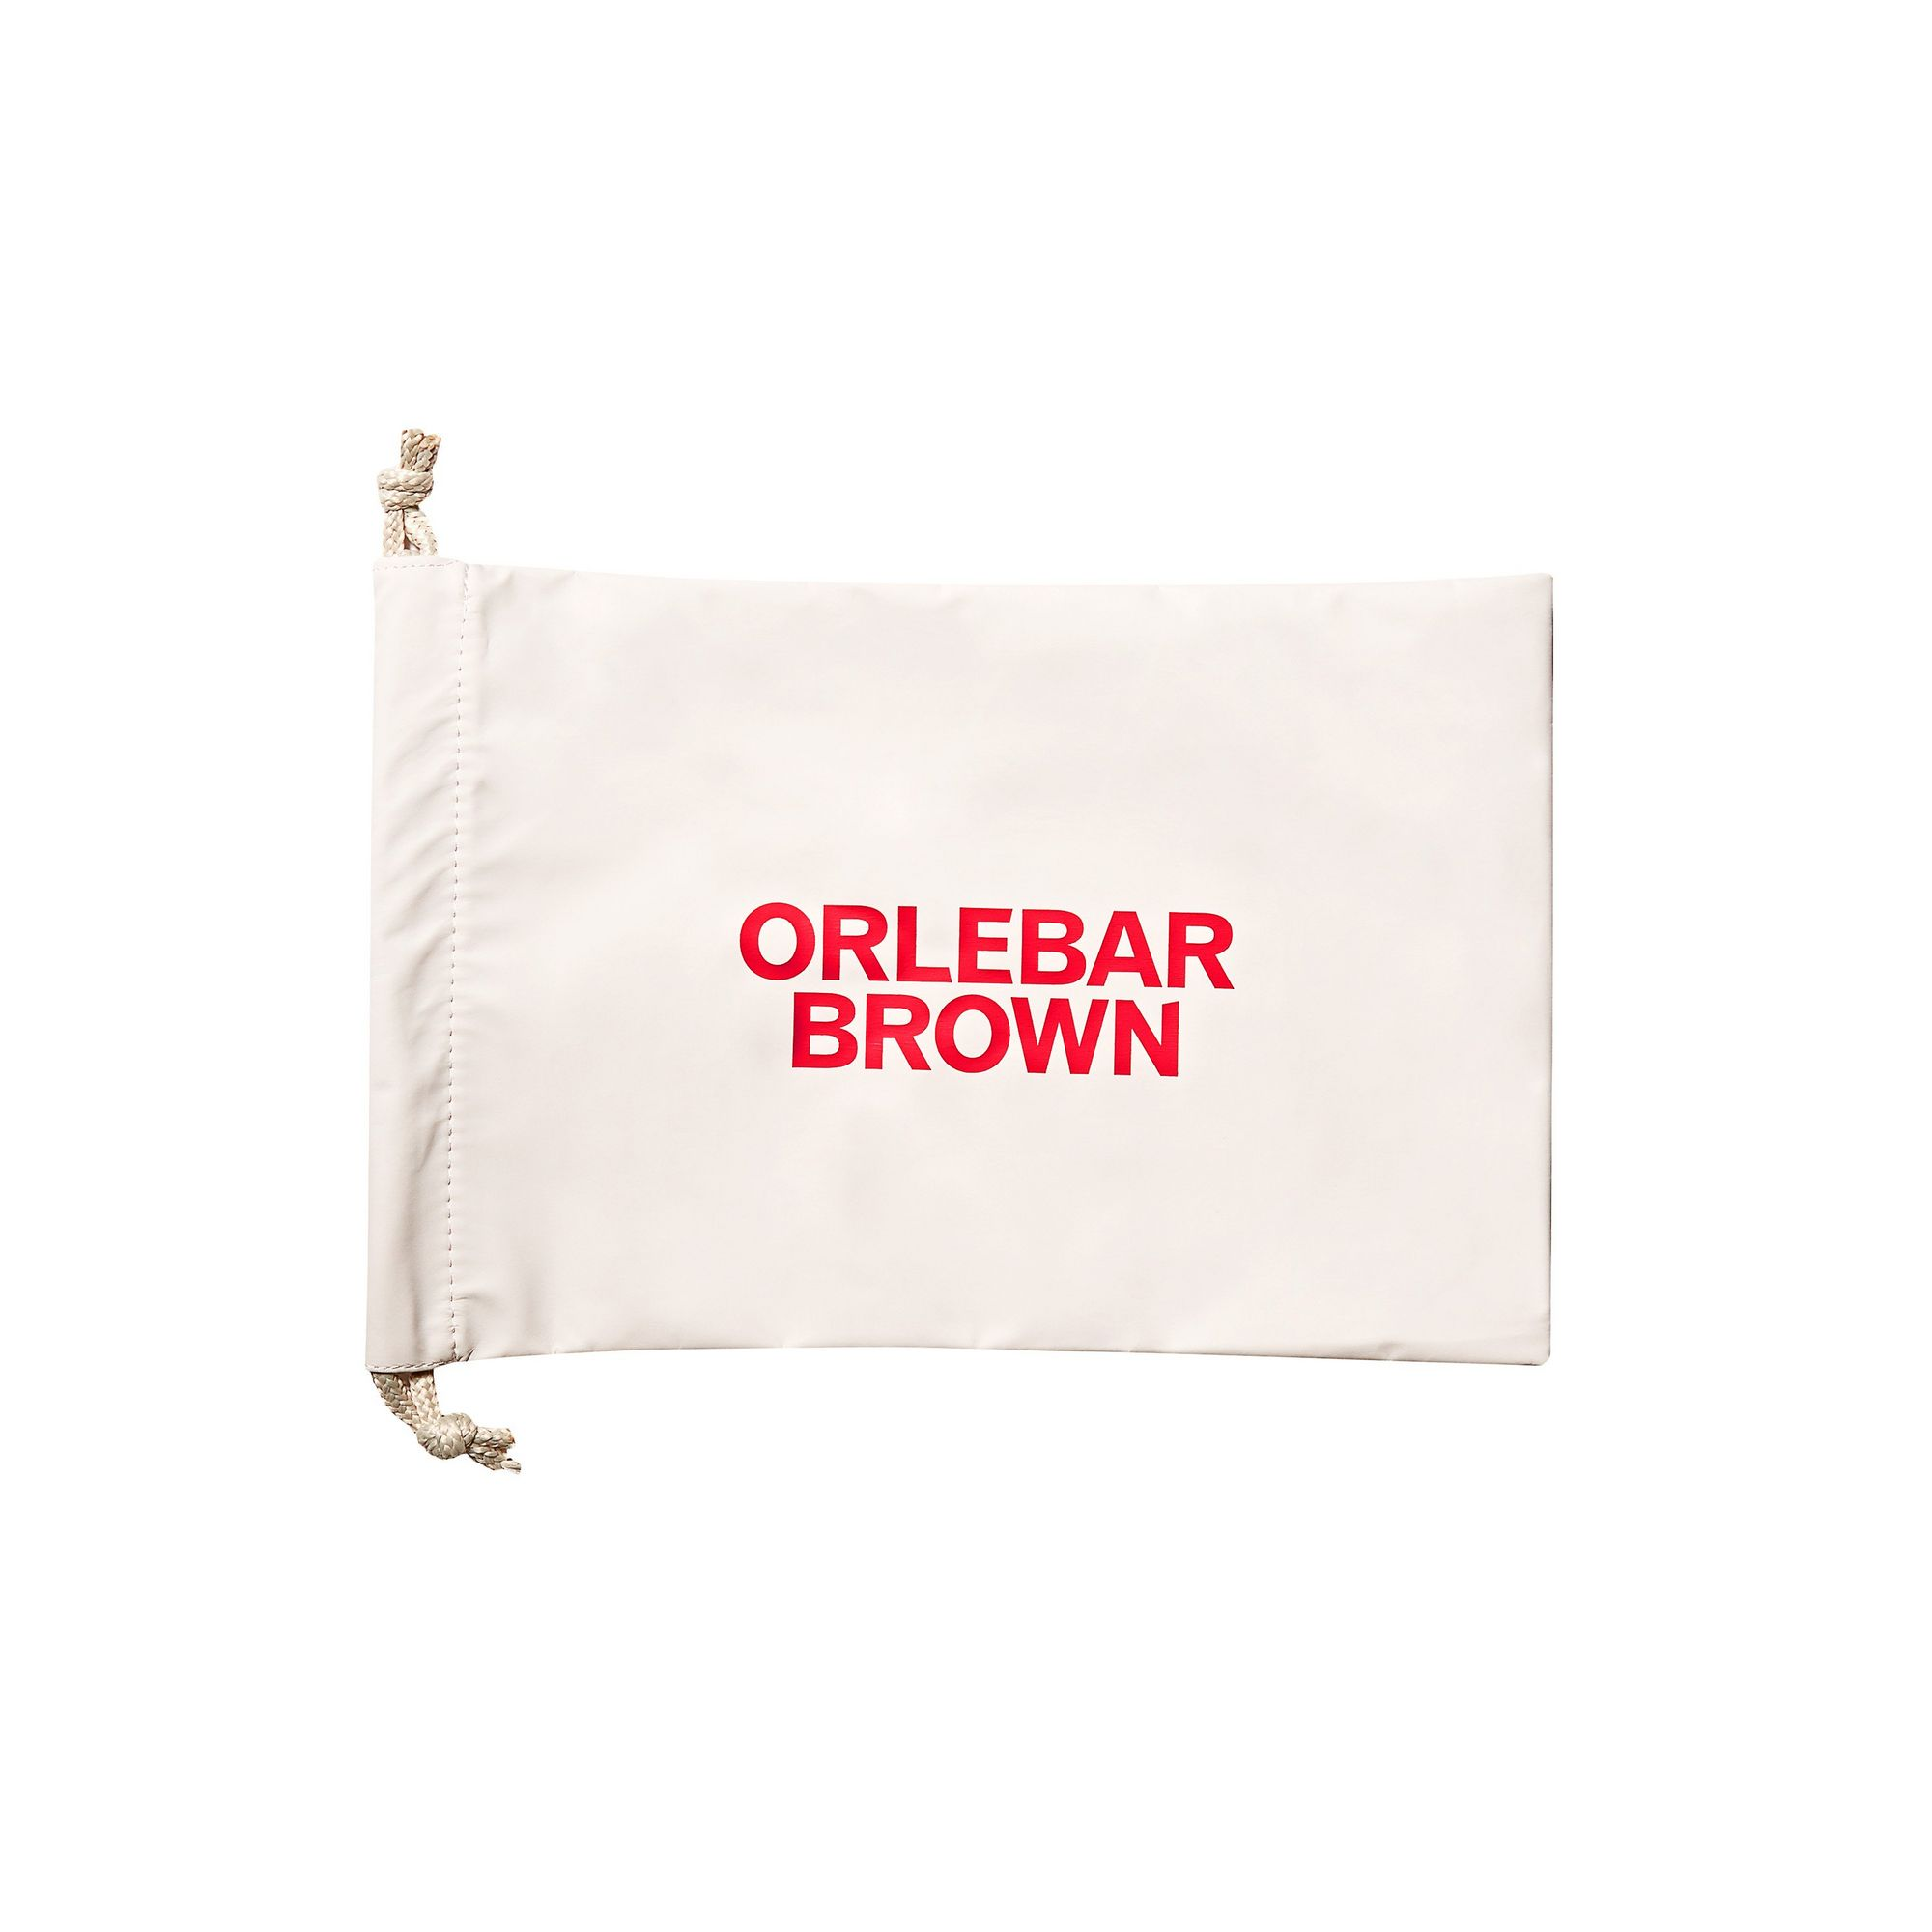 Orlebar Brown Bulldog Sport